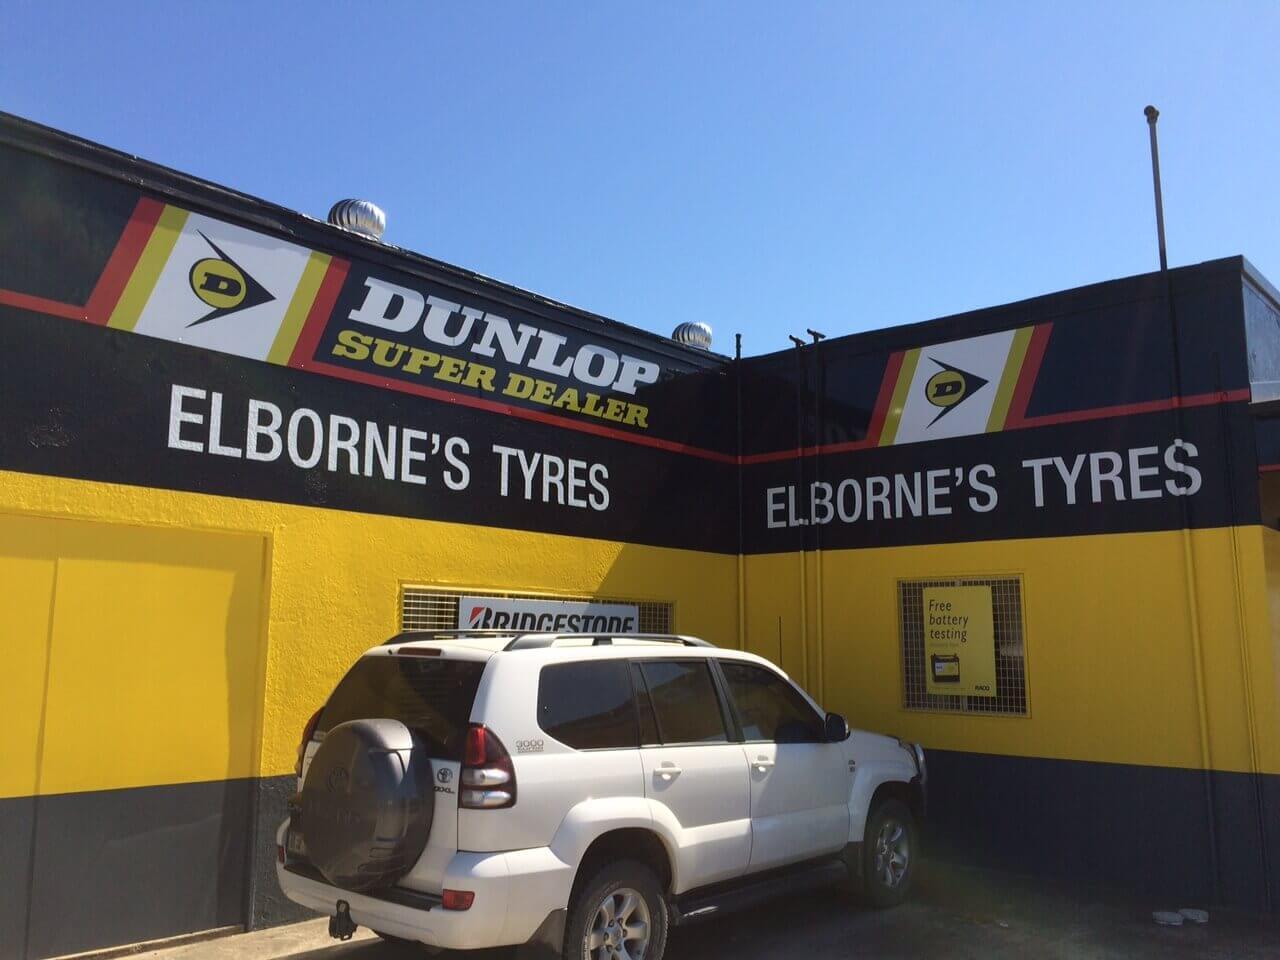 Elborne's Tyres shop front